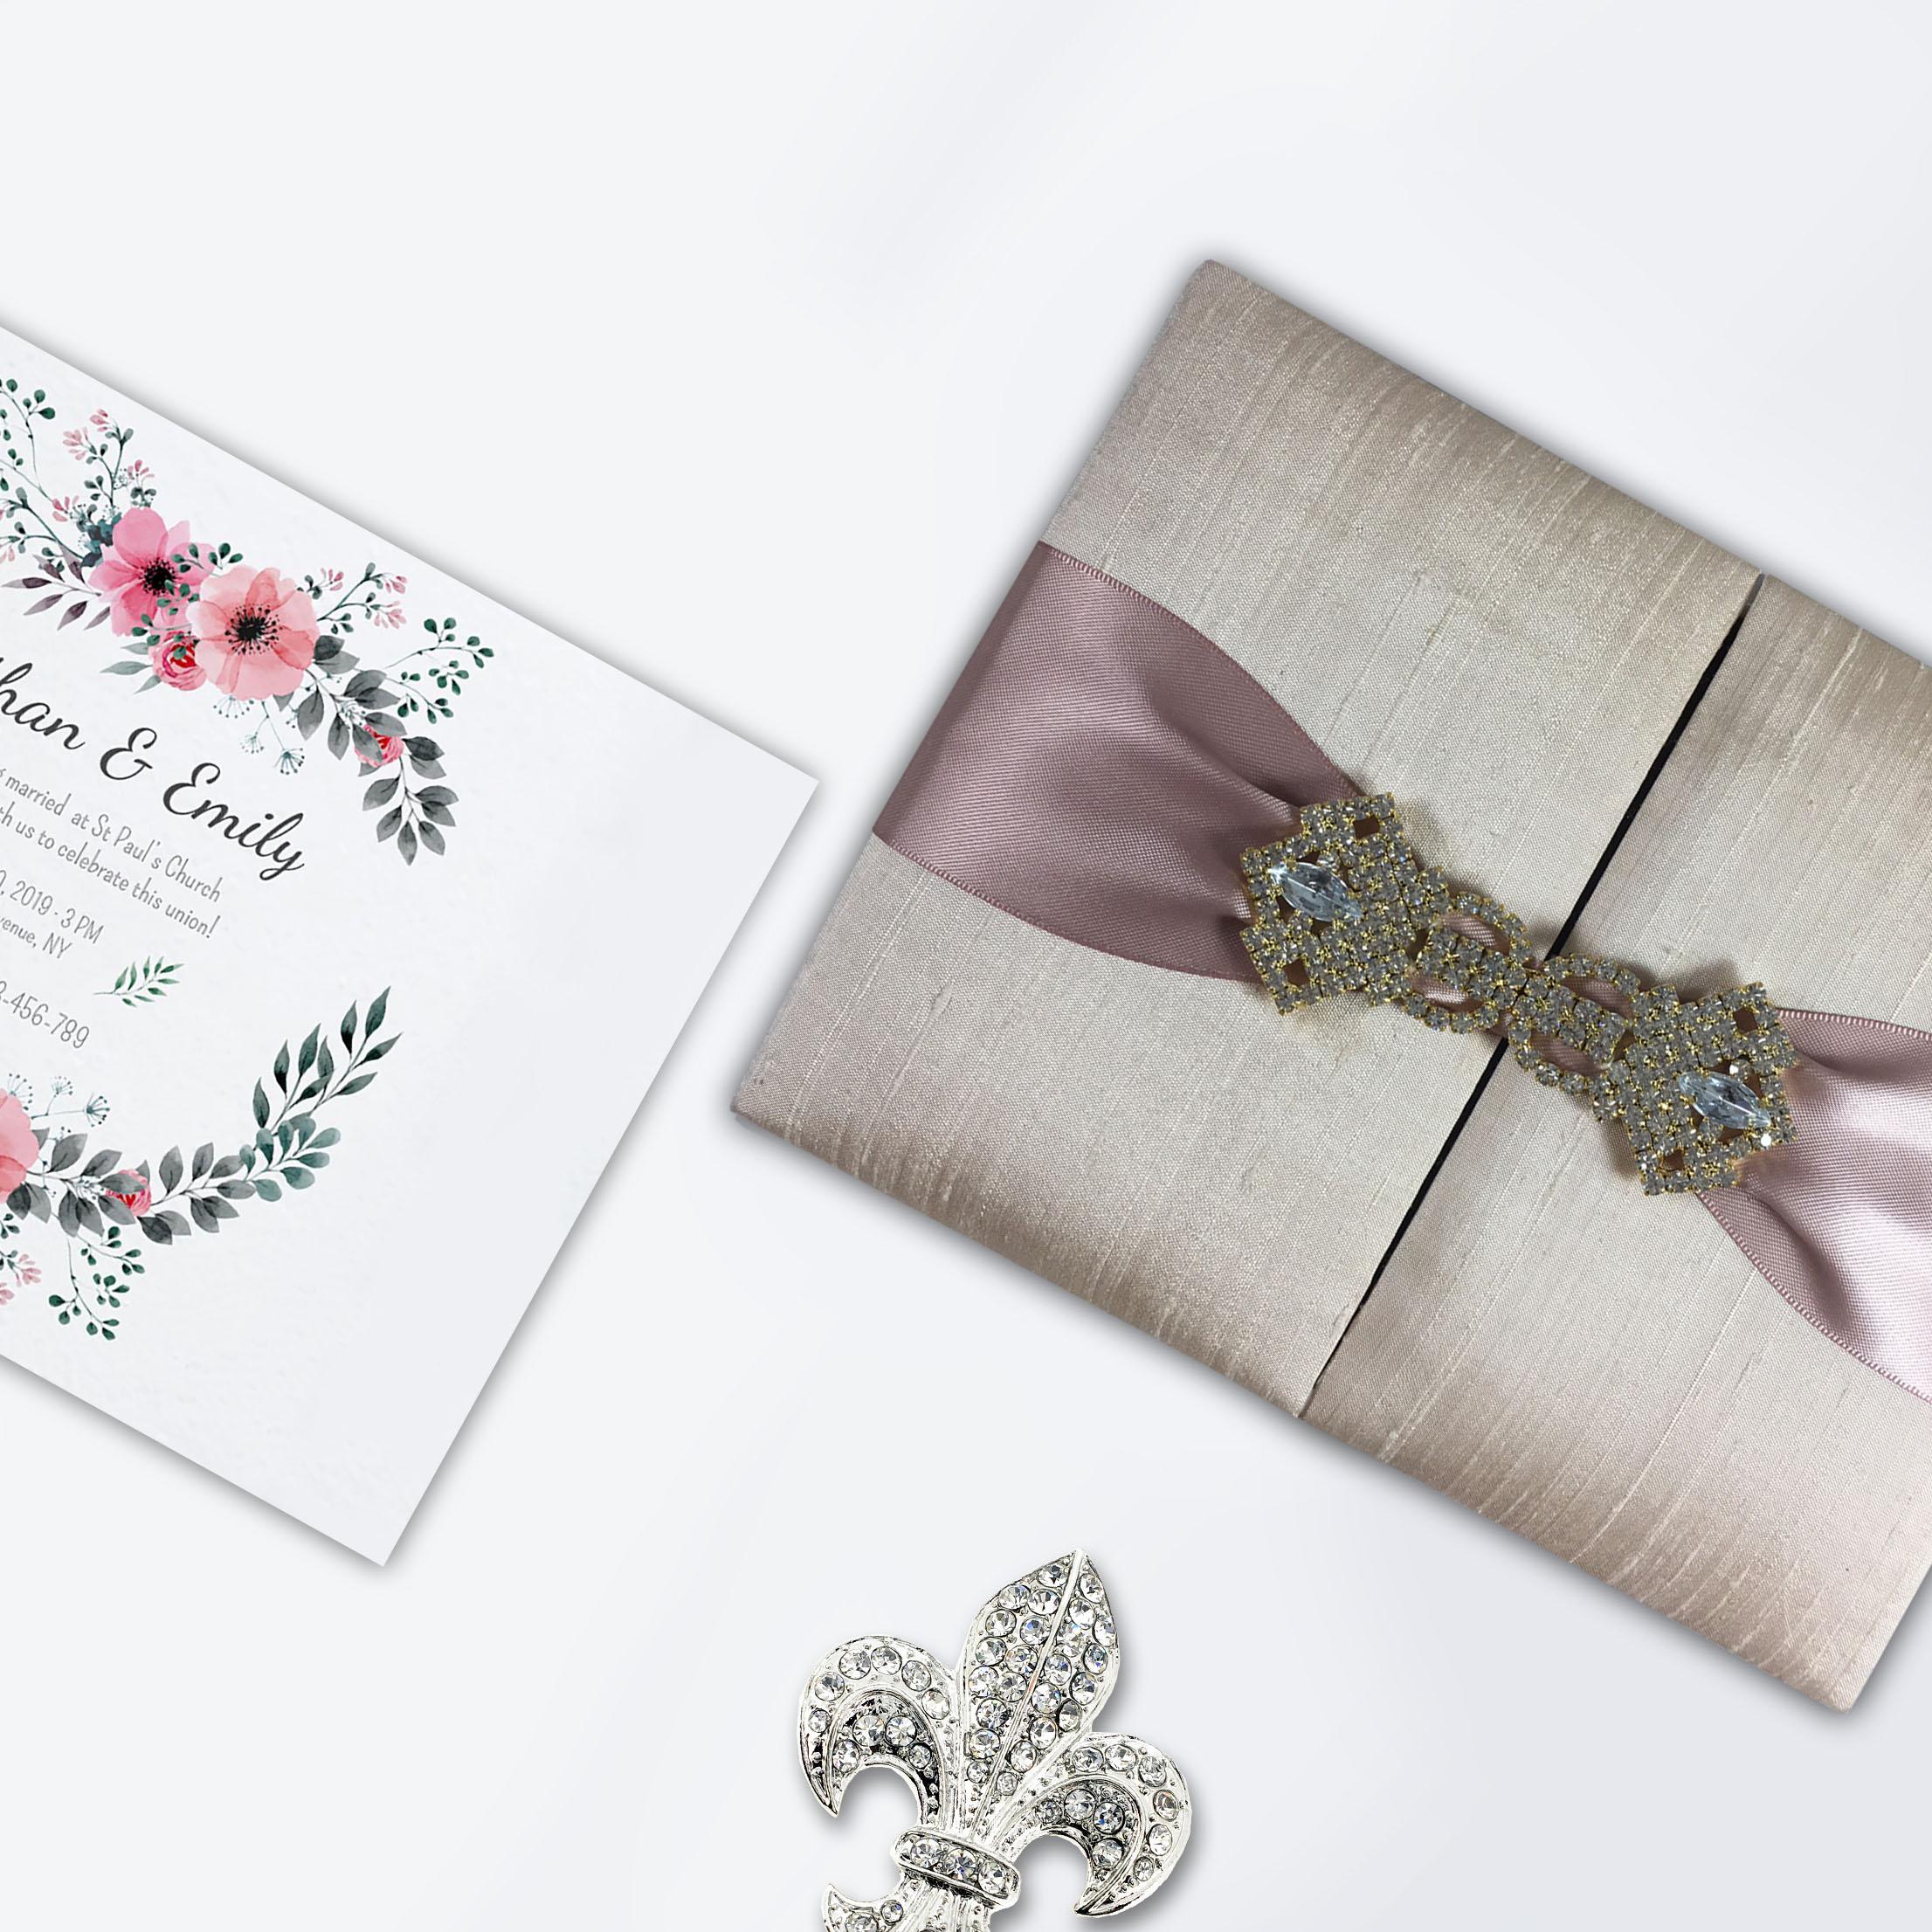 Thai Wedding Gifts: The Original Thai Silk Wedding Invitation Box With Gold